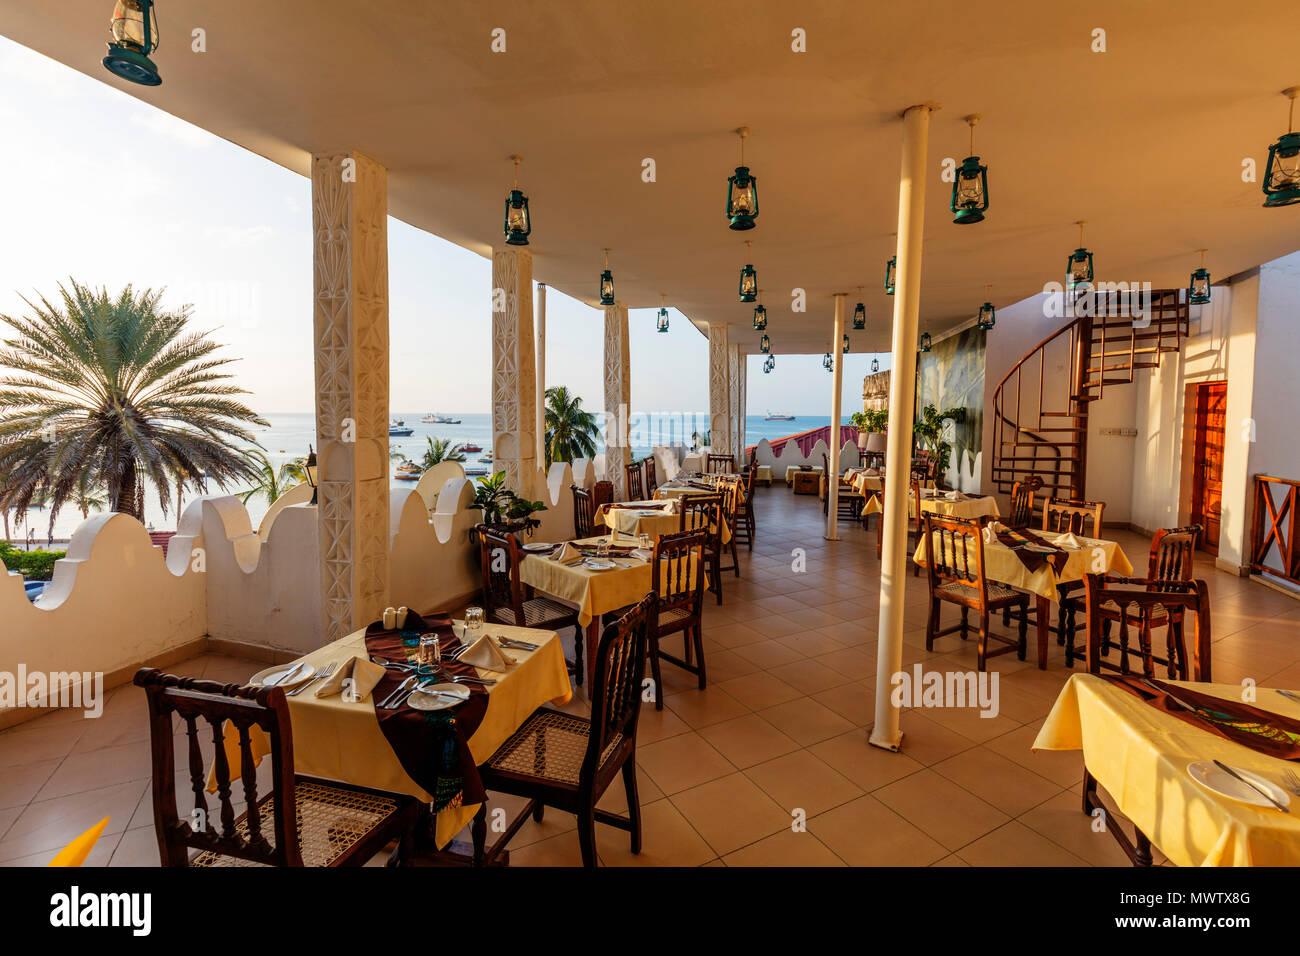 Dining room of The Seyyida Hotel and Spa, Stone Town, Island of Zanzibar, Tanzania, East Africa, Africa - Stock Image